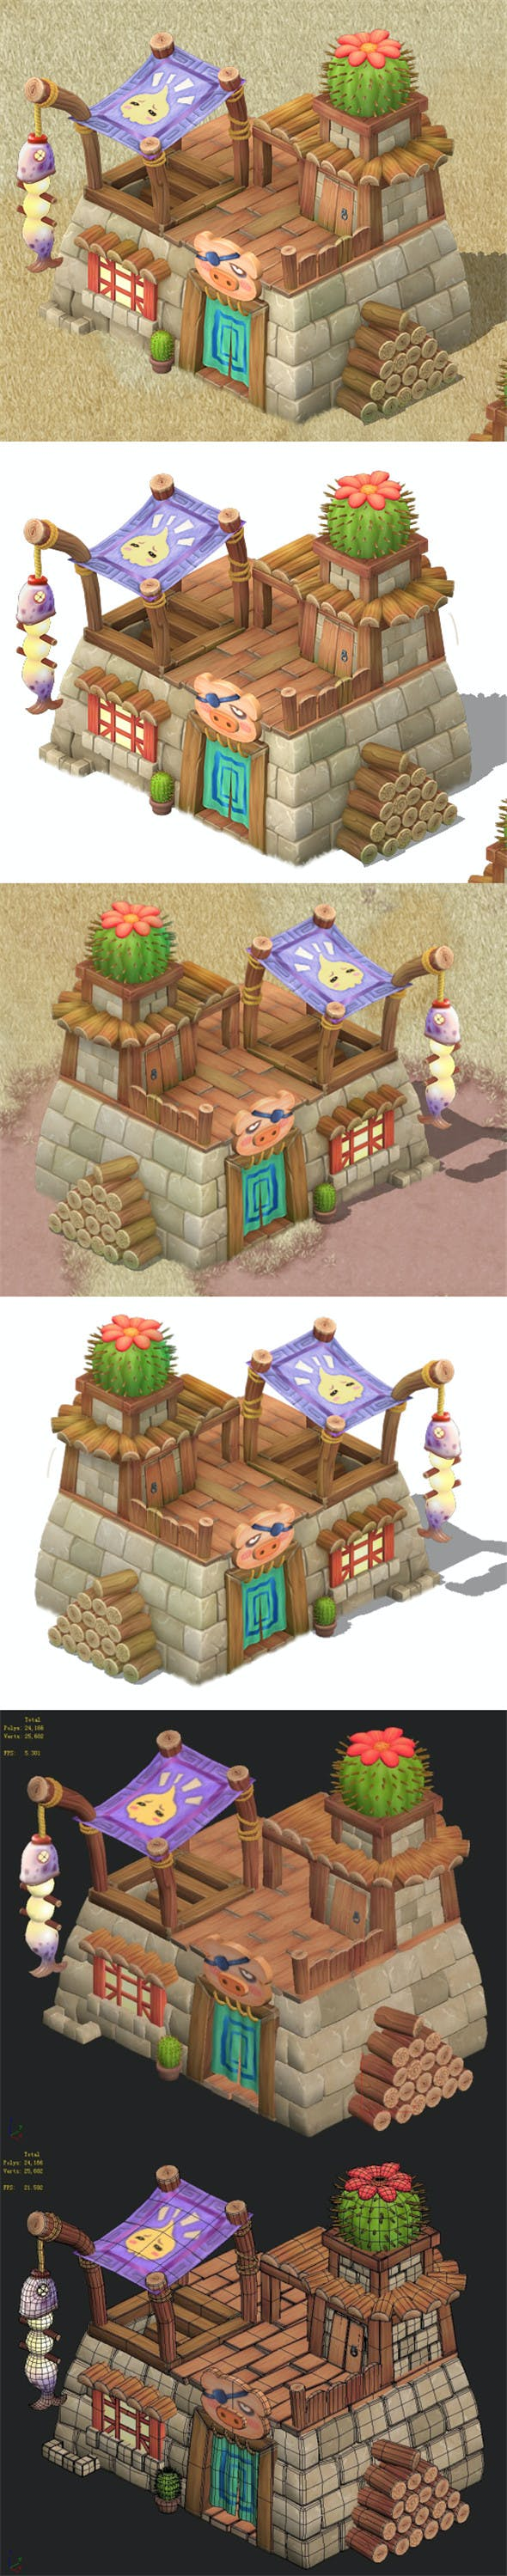 Cartoon version - residential 0103 - 3DOcean Item for Sale